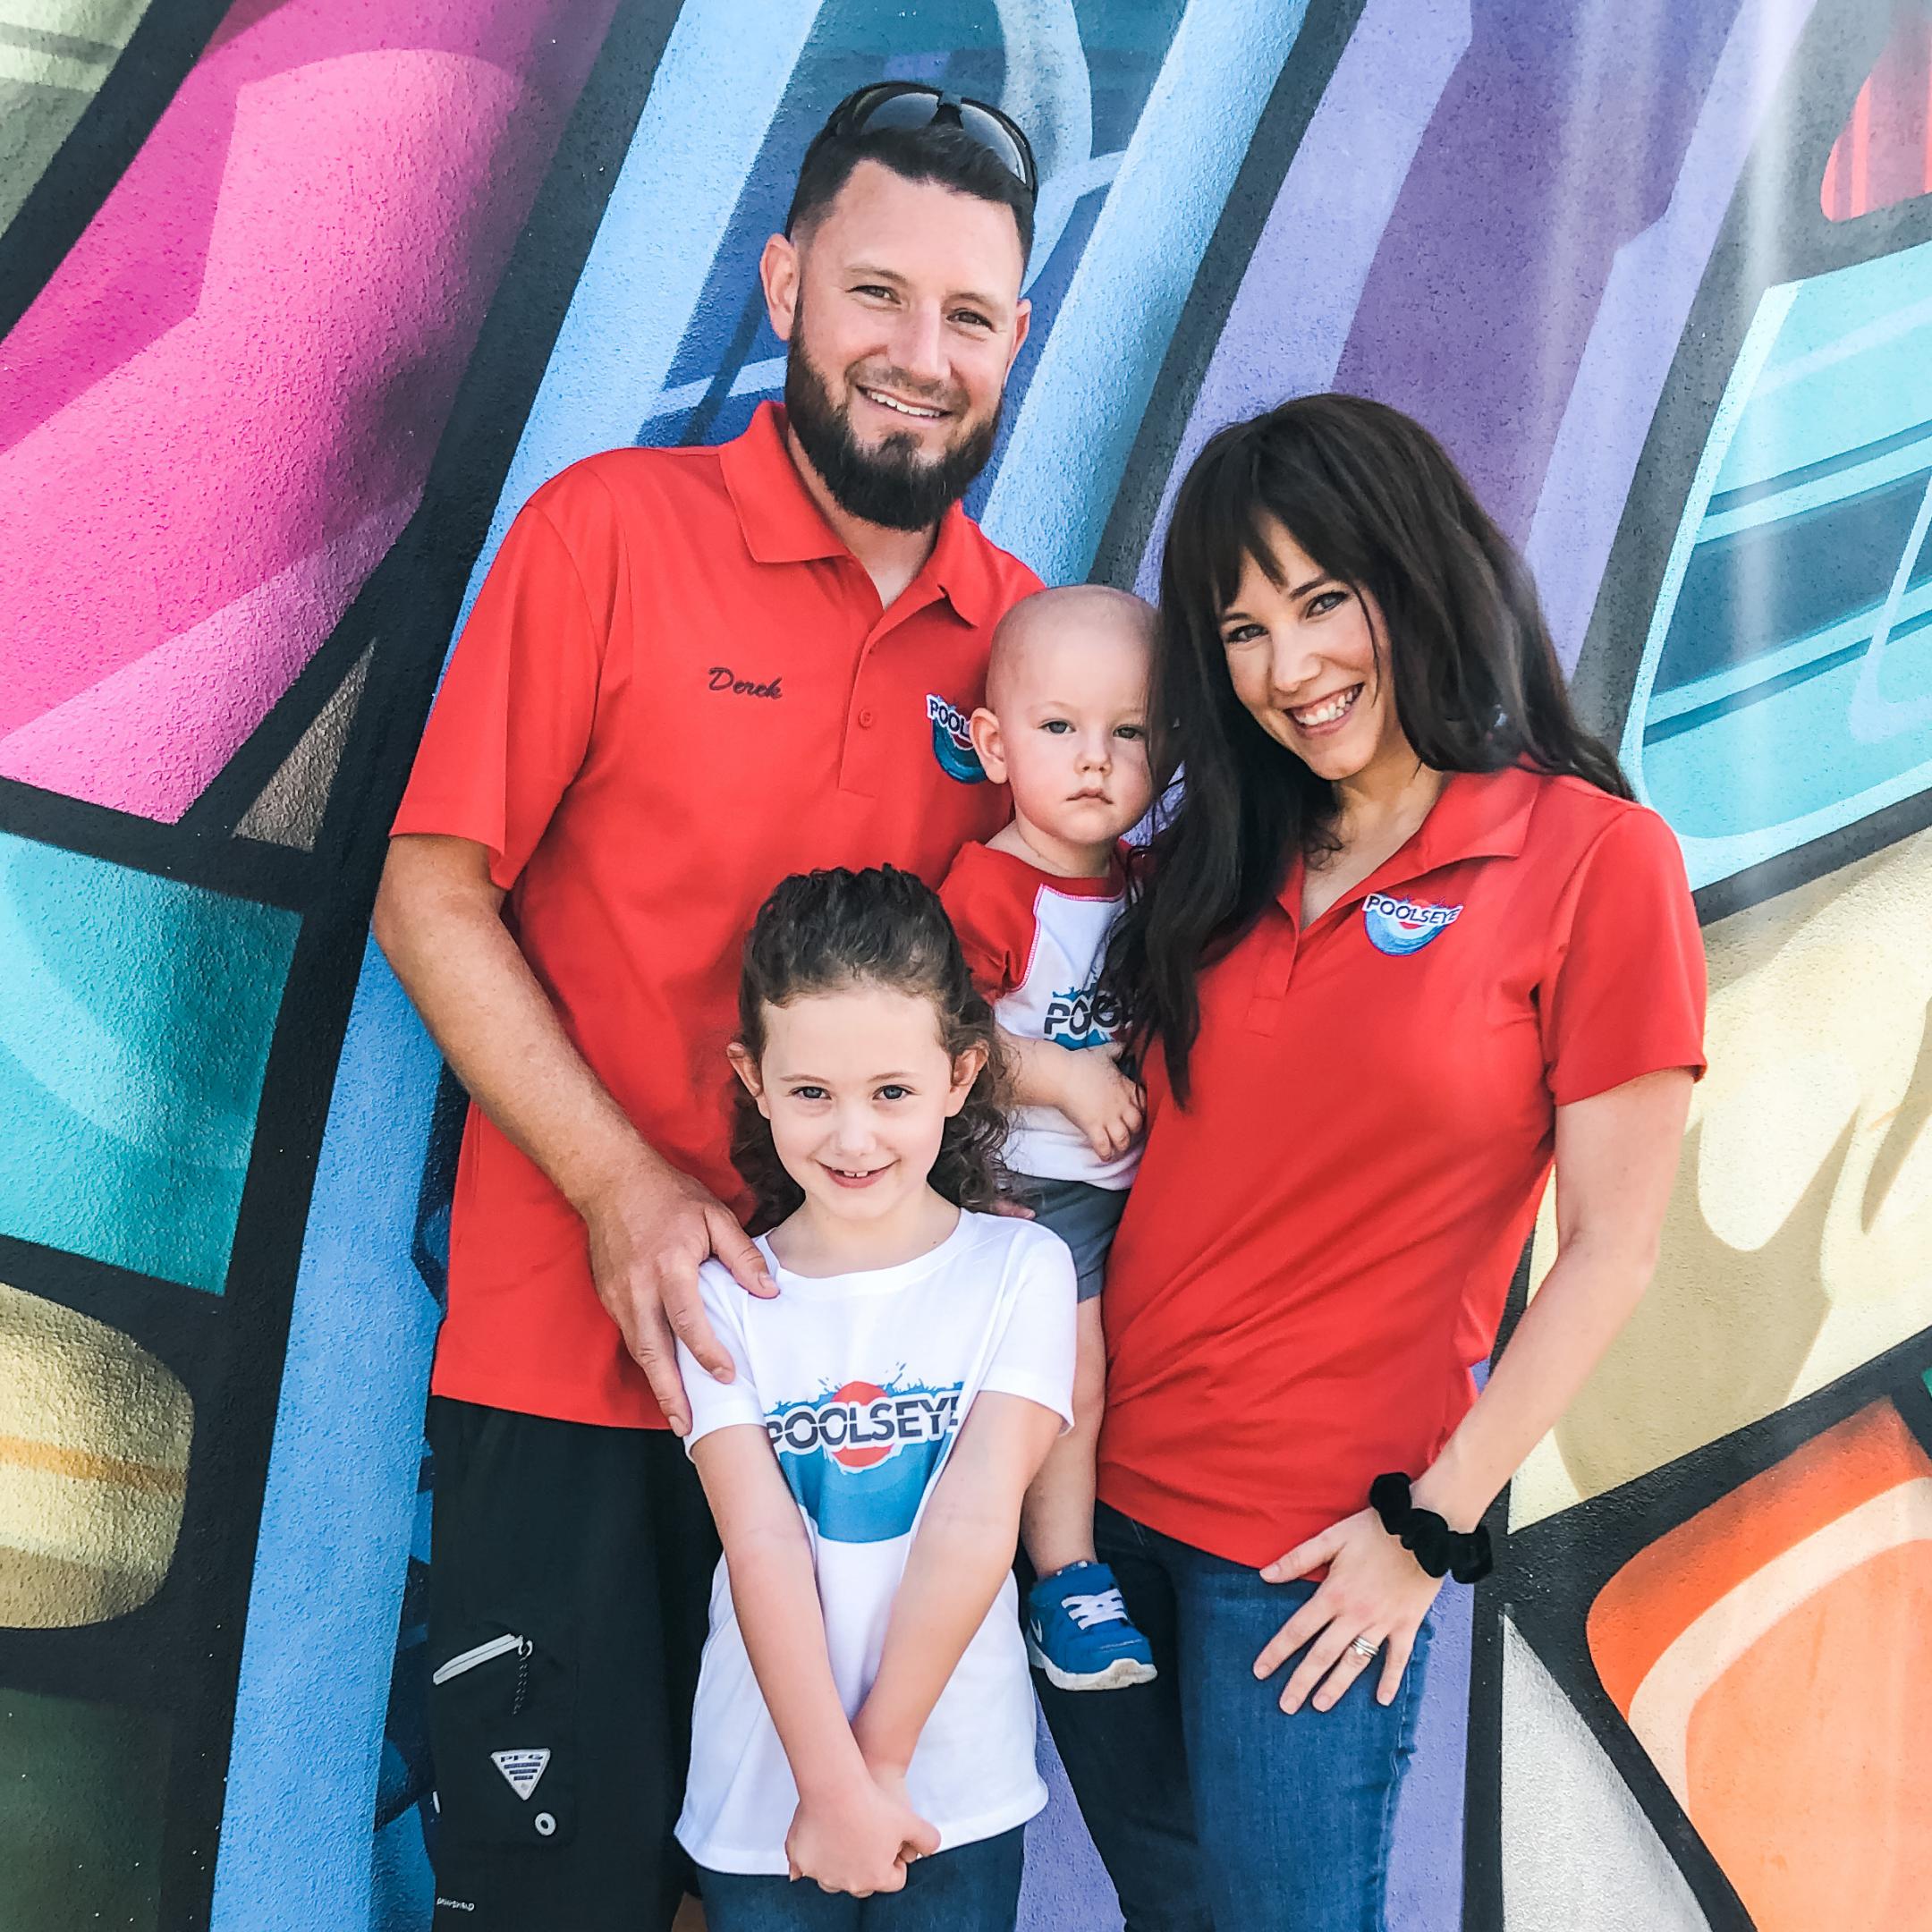 Poolseye Family Mural Square 2020